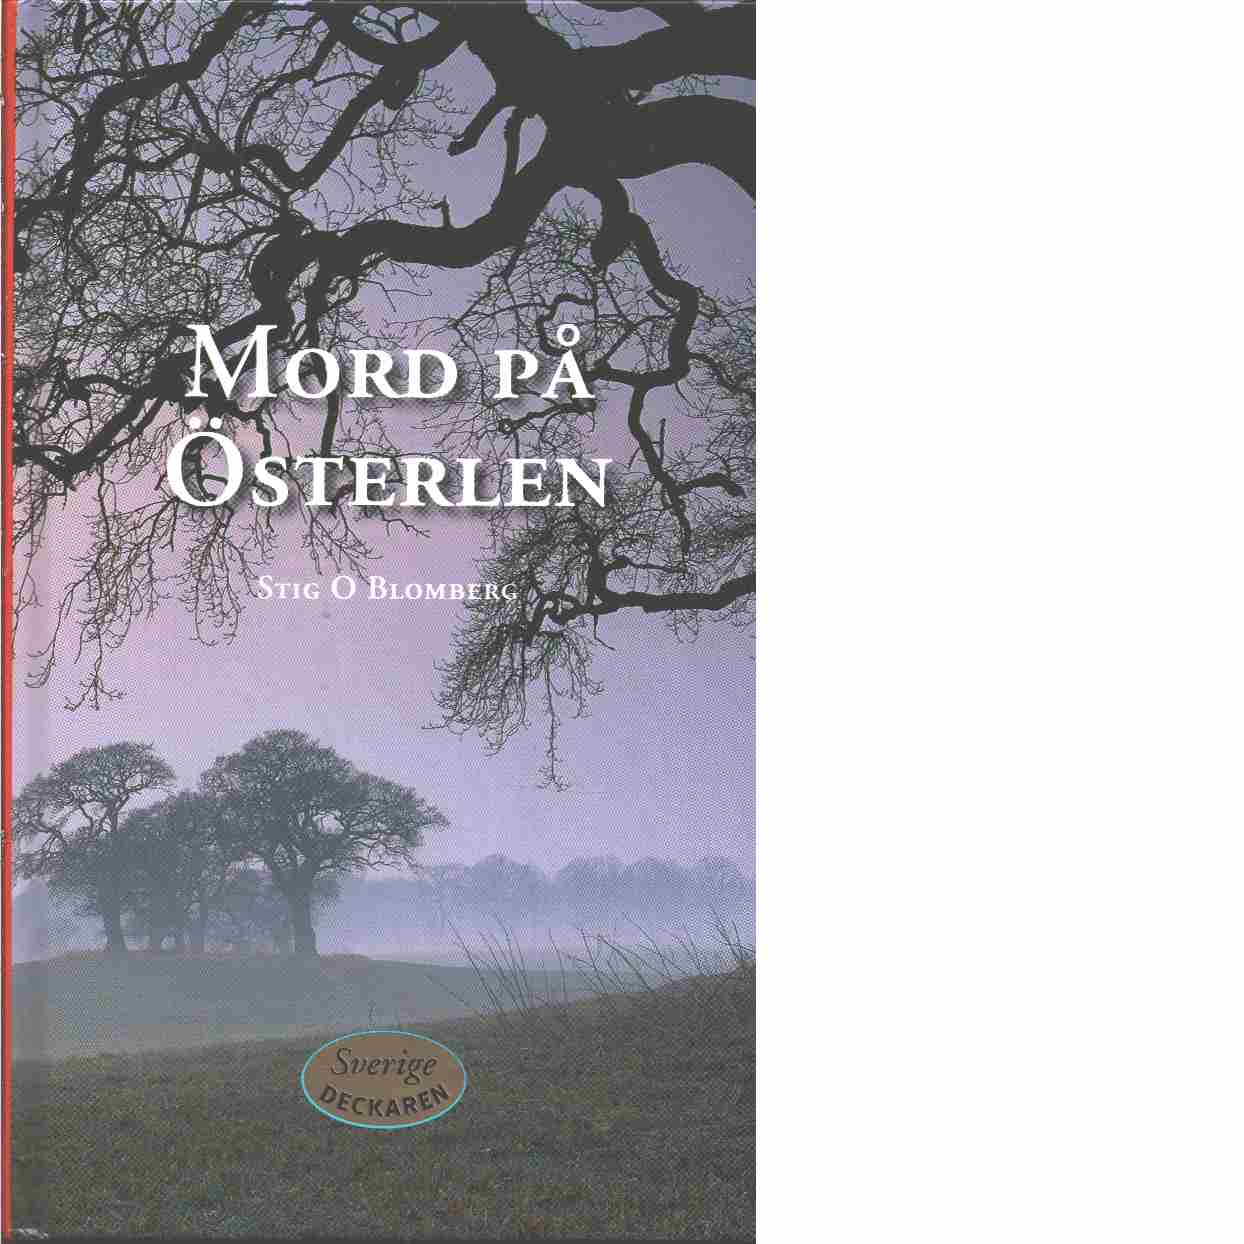 Mord på Österlen - Blomberg, Stig O.